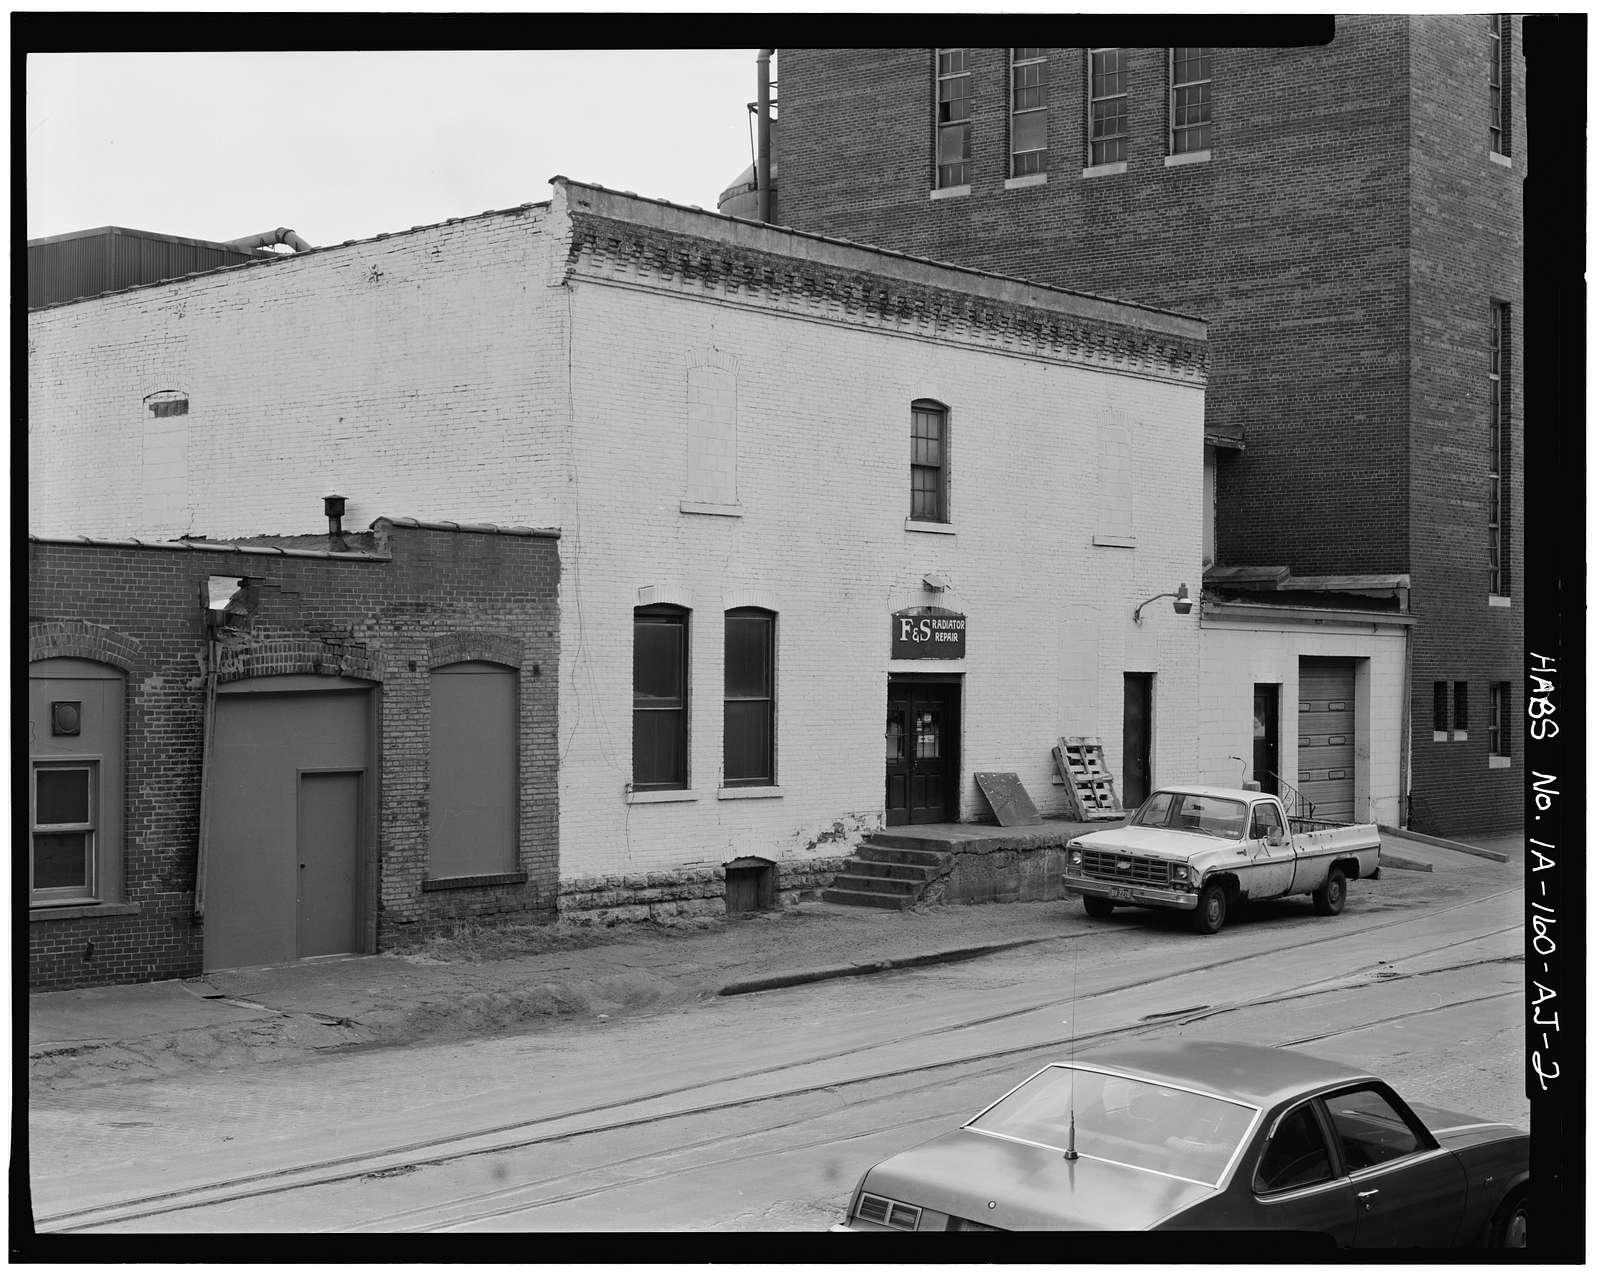 Commercial & Industrial Buildings, Wieneke-Hoerr Company Factory, 850 Jackson Street, Dubuque, Dubuque County, IA